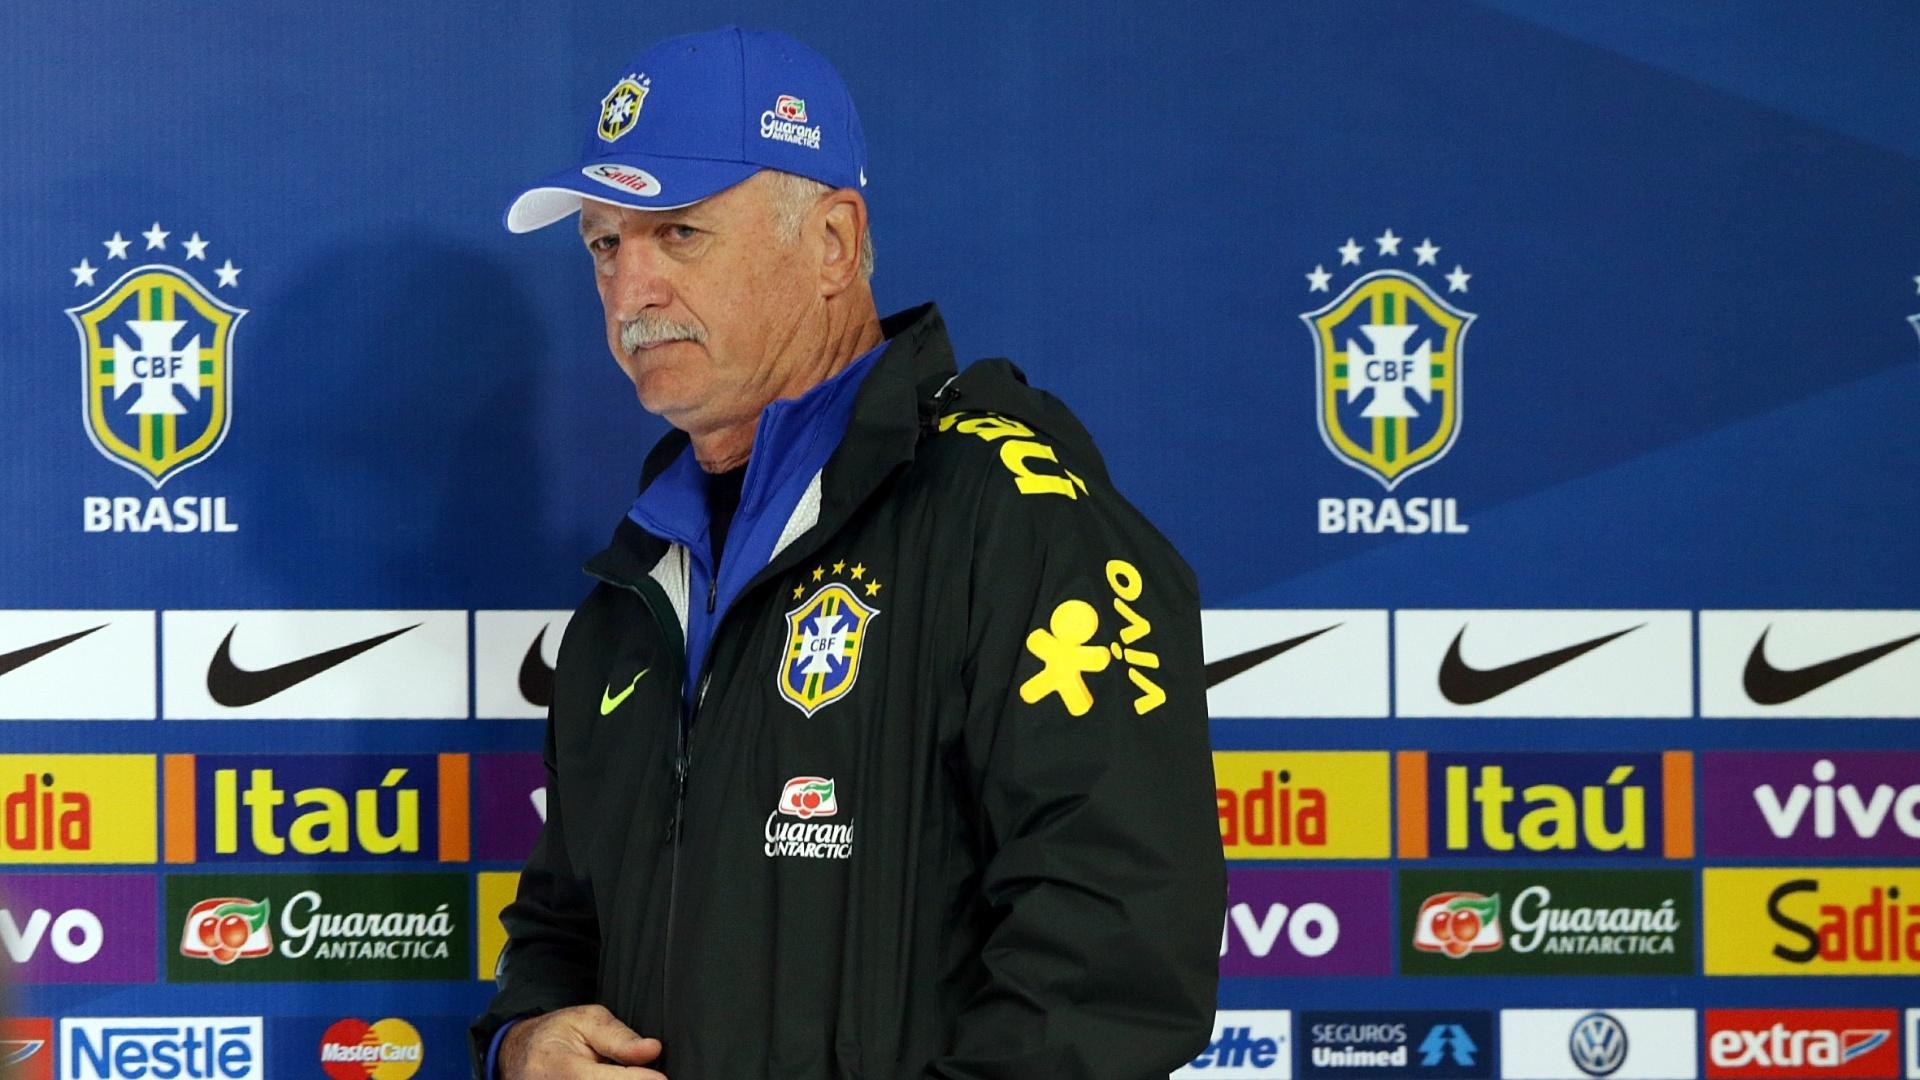 05.jun.2014 - Técnico Luiz Felipe Scolari concede entrevista coletiva na Granja Comary